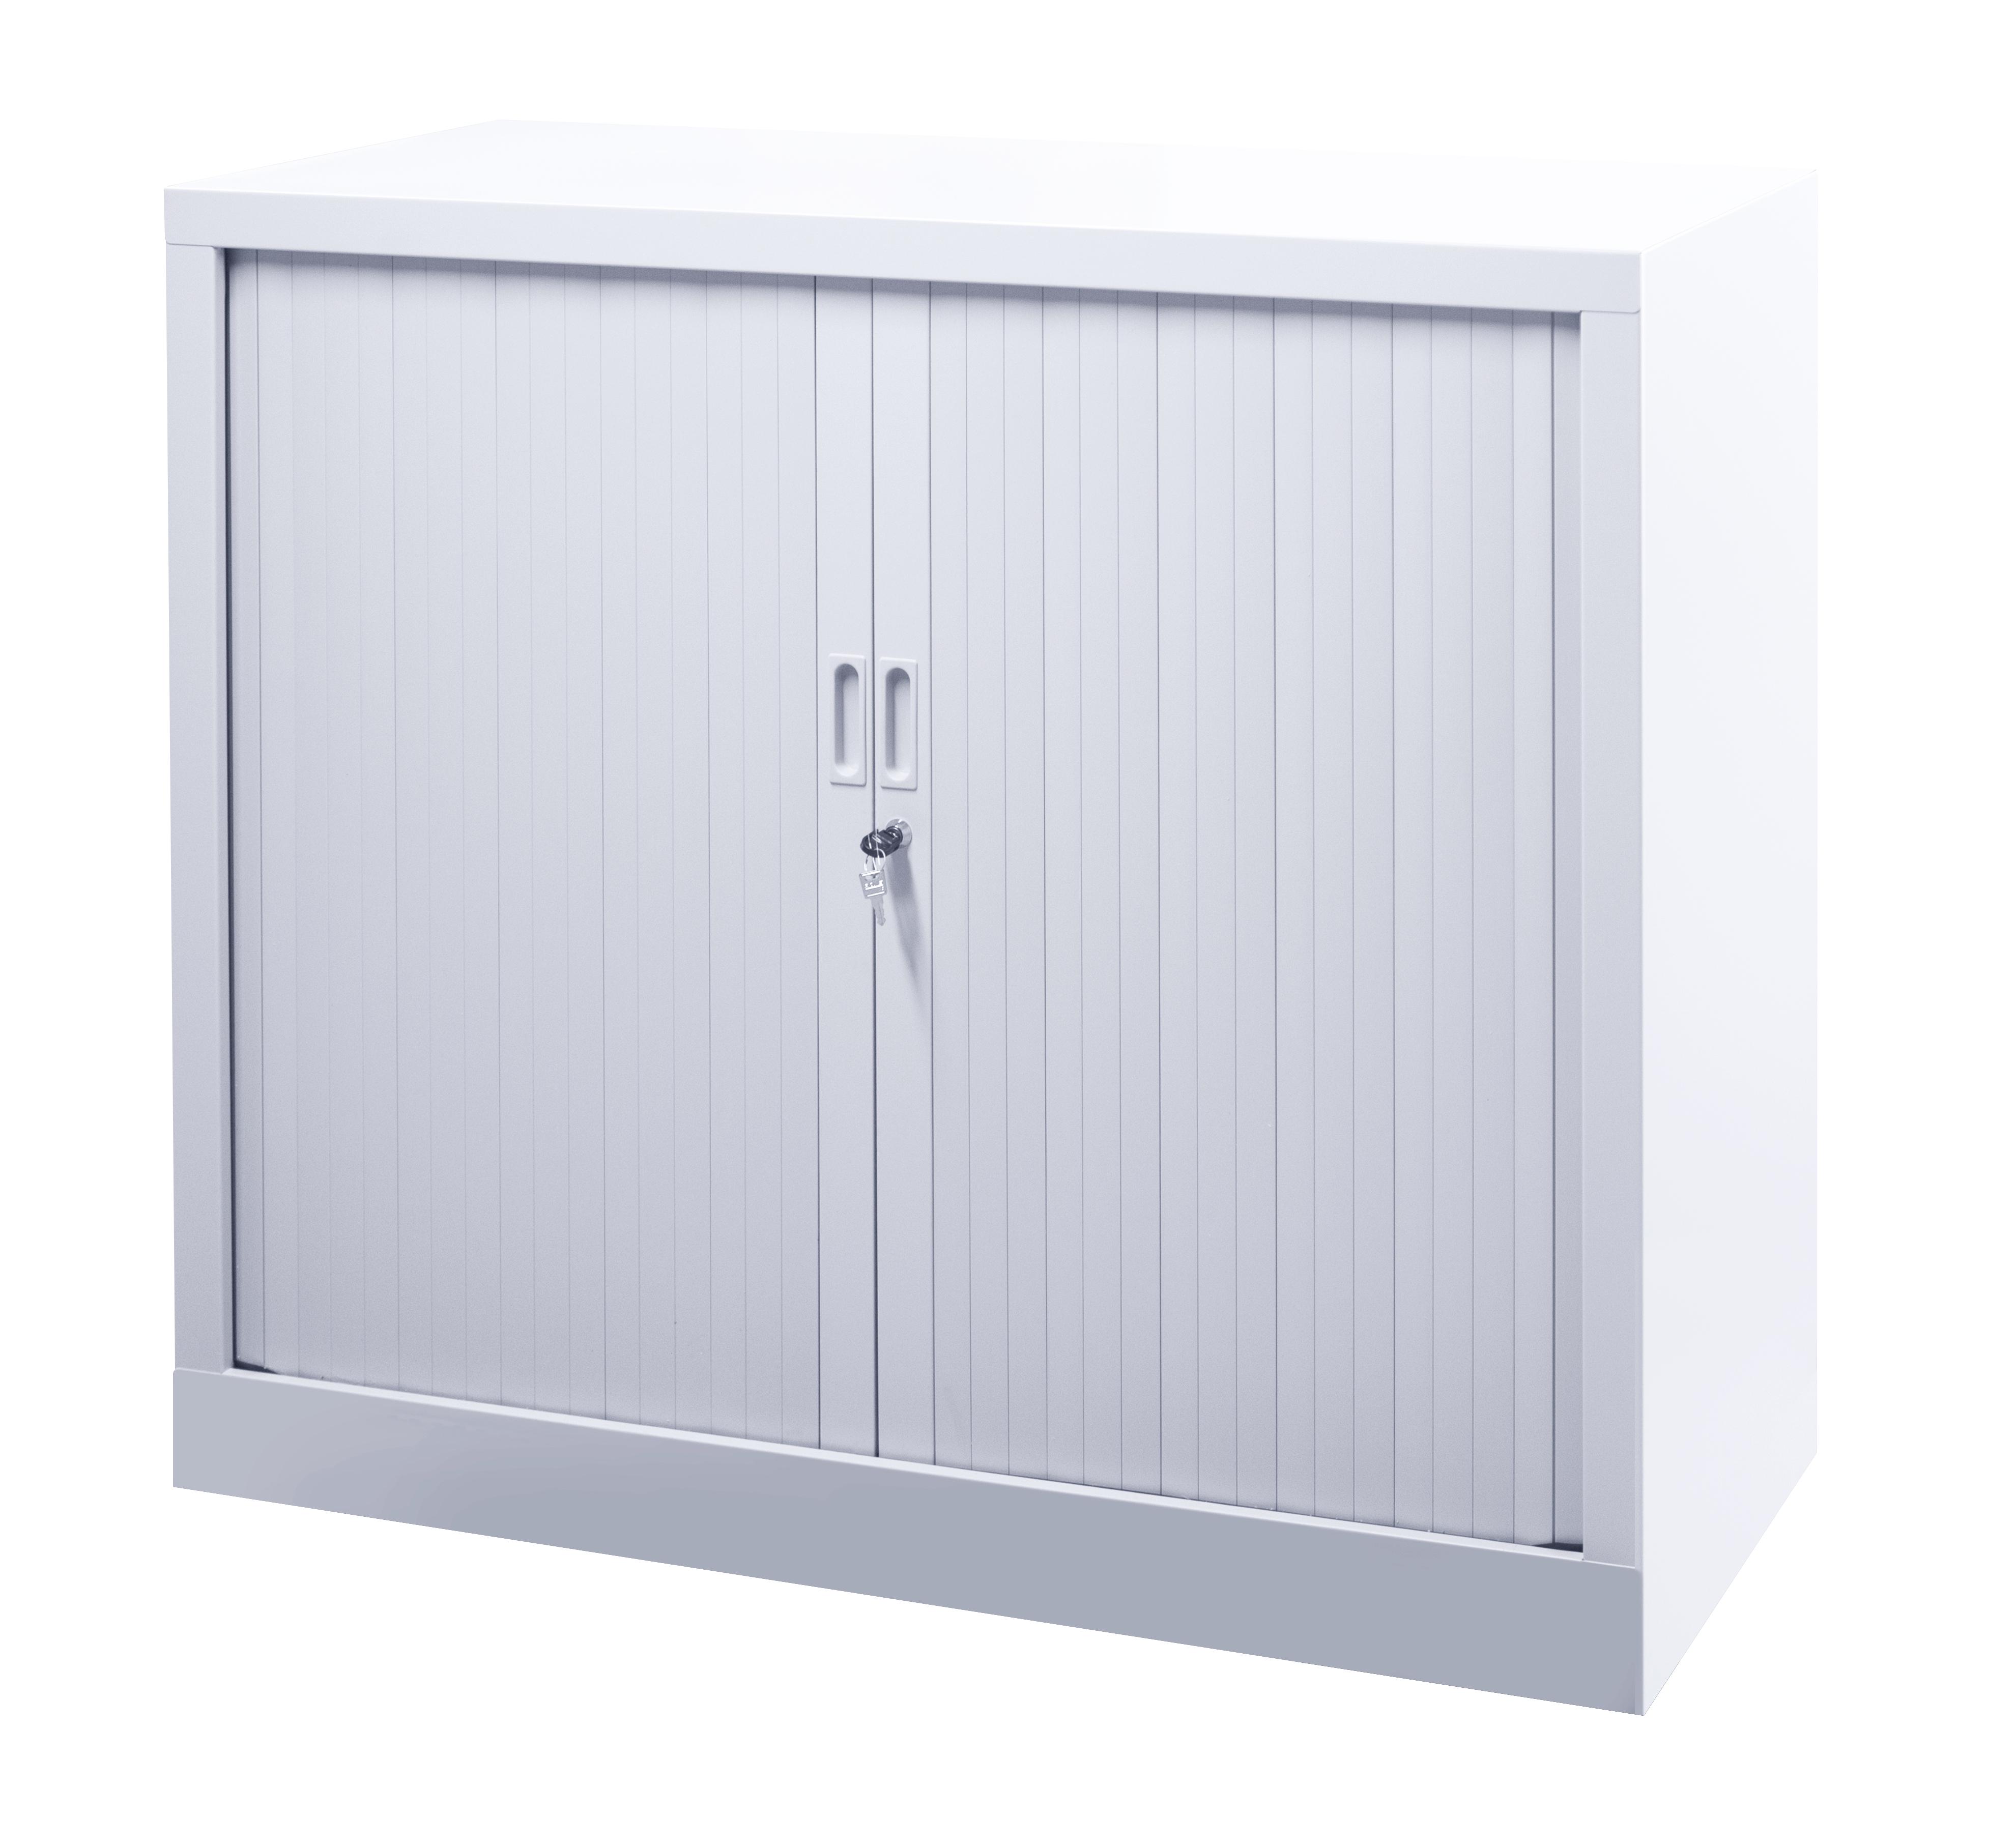 Armoire designe armoire de bureau m tallique porte - Armoire metallique bureau ikea ...